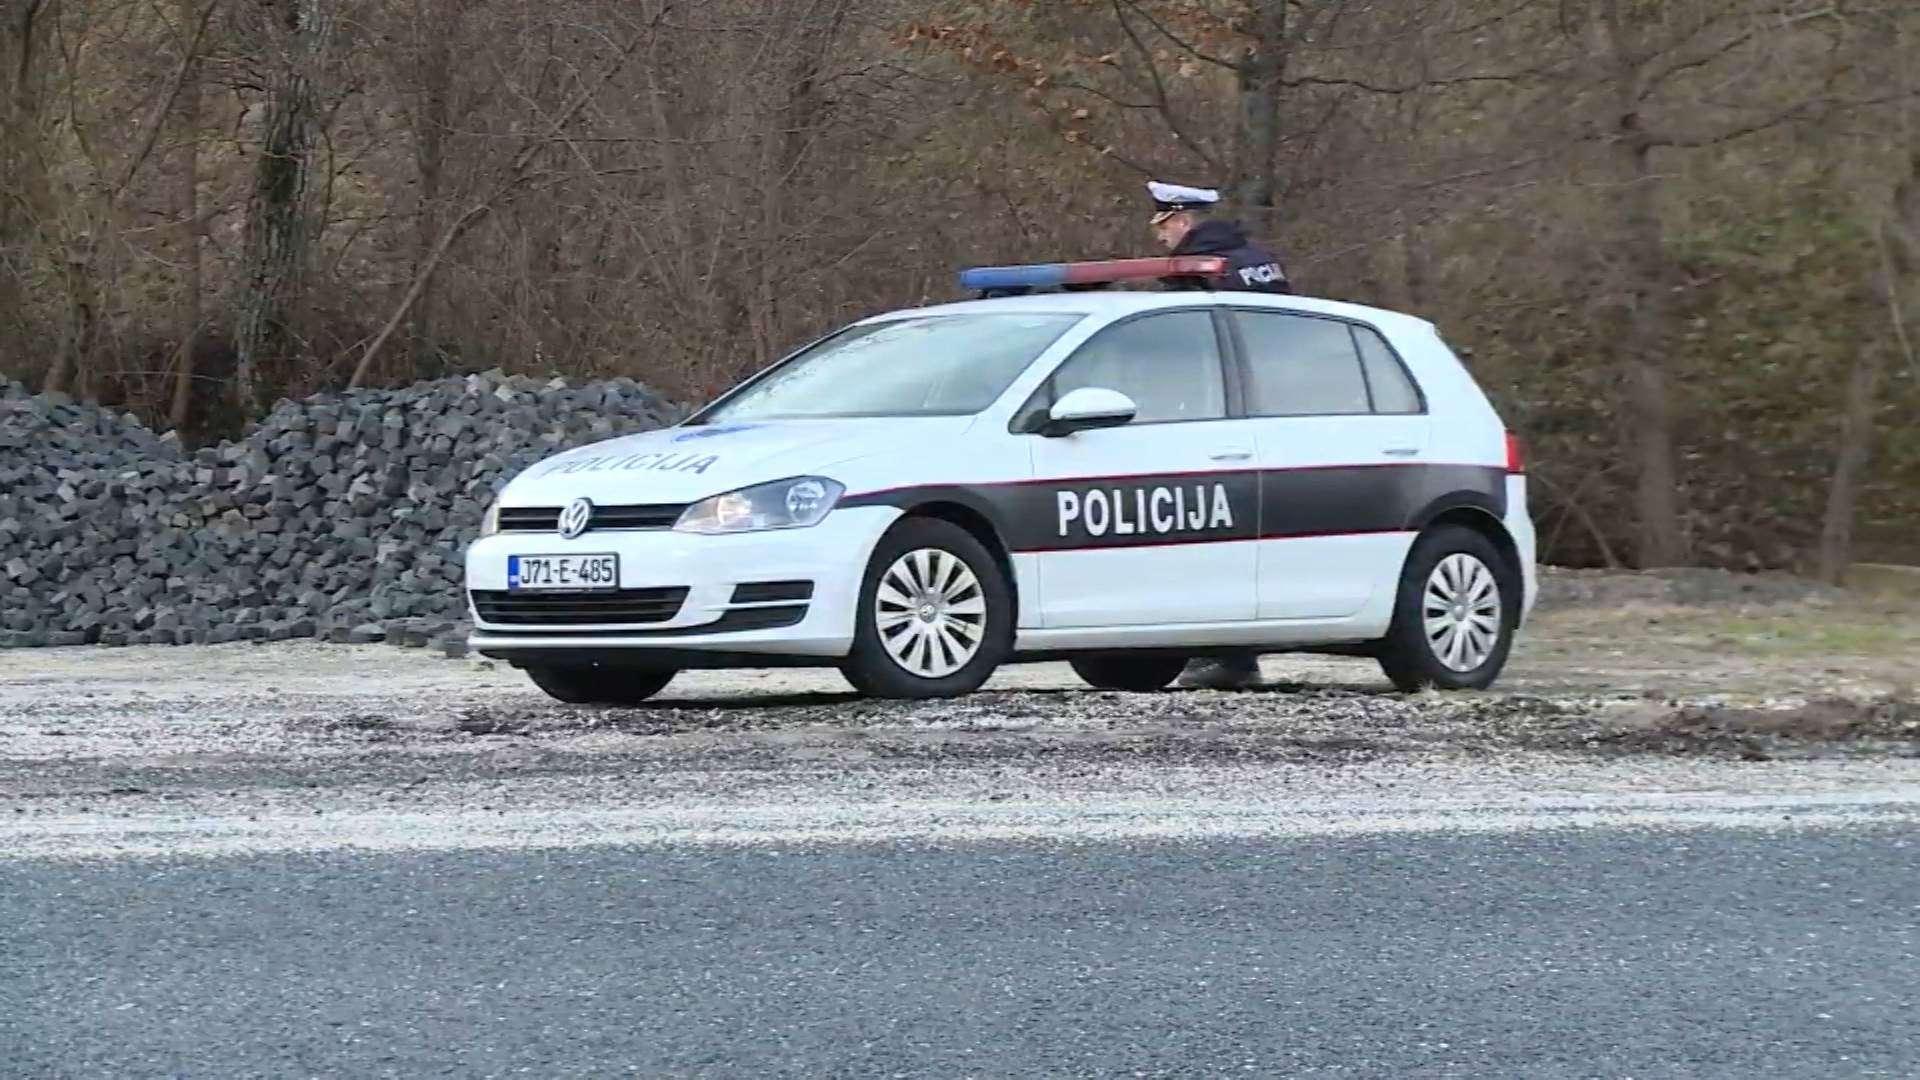 mup hnk pokrenuo disciplinski postupak protiv trojice policijskih službenika